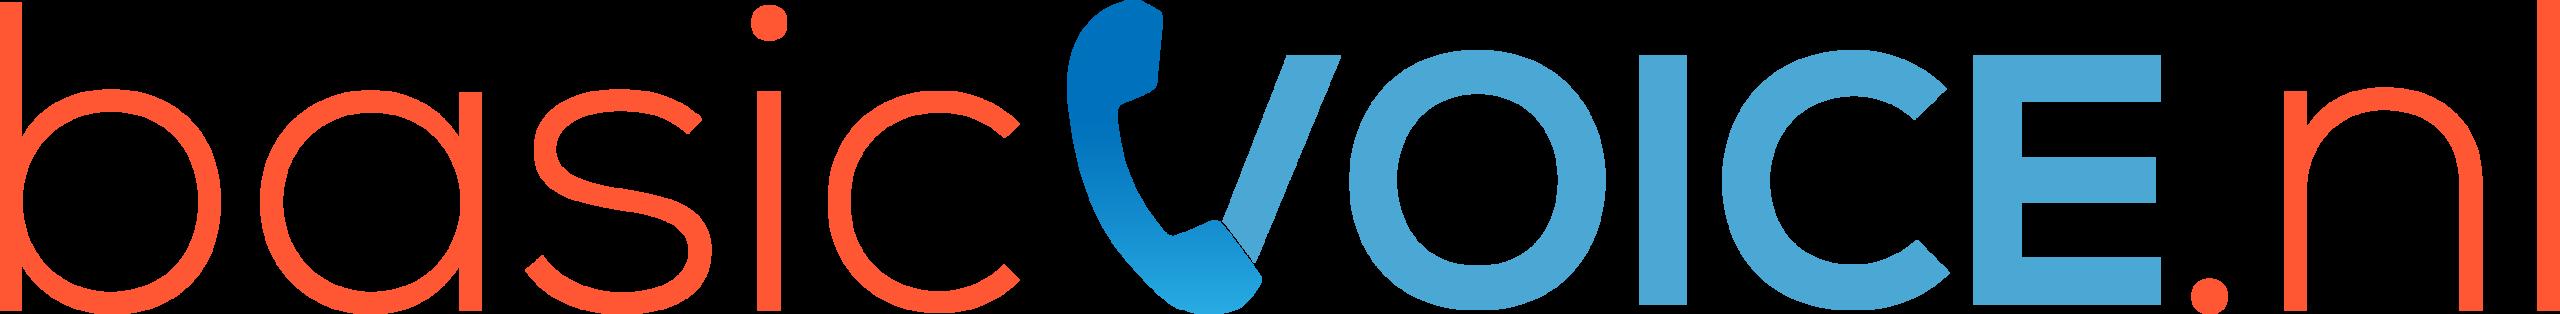 basicVoice.nl